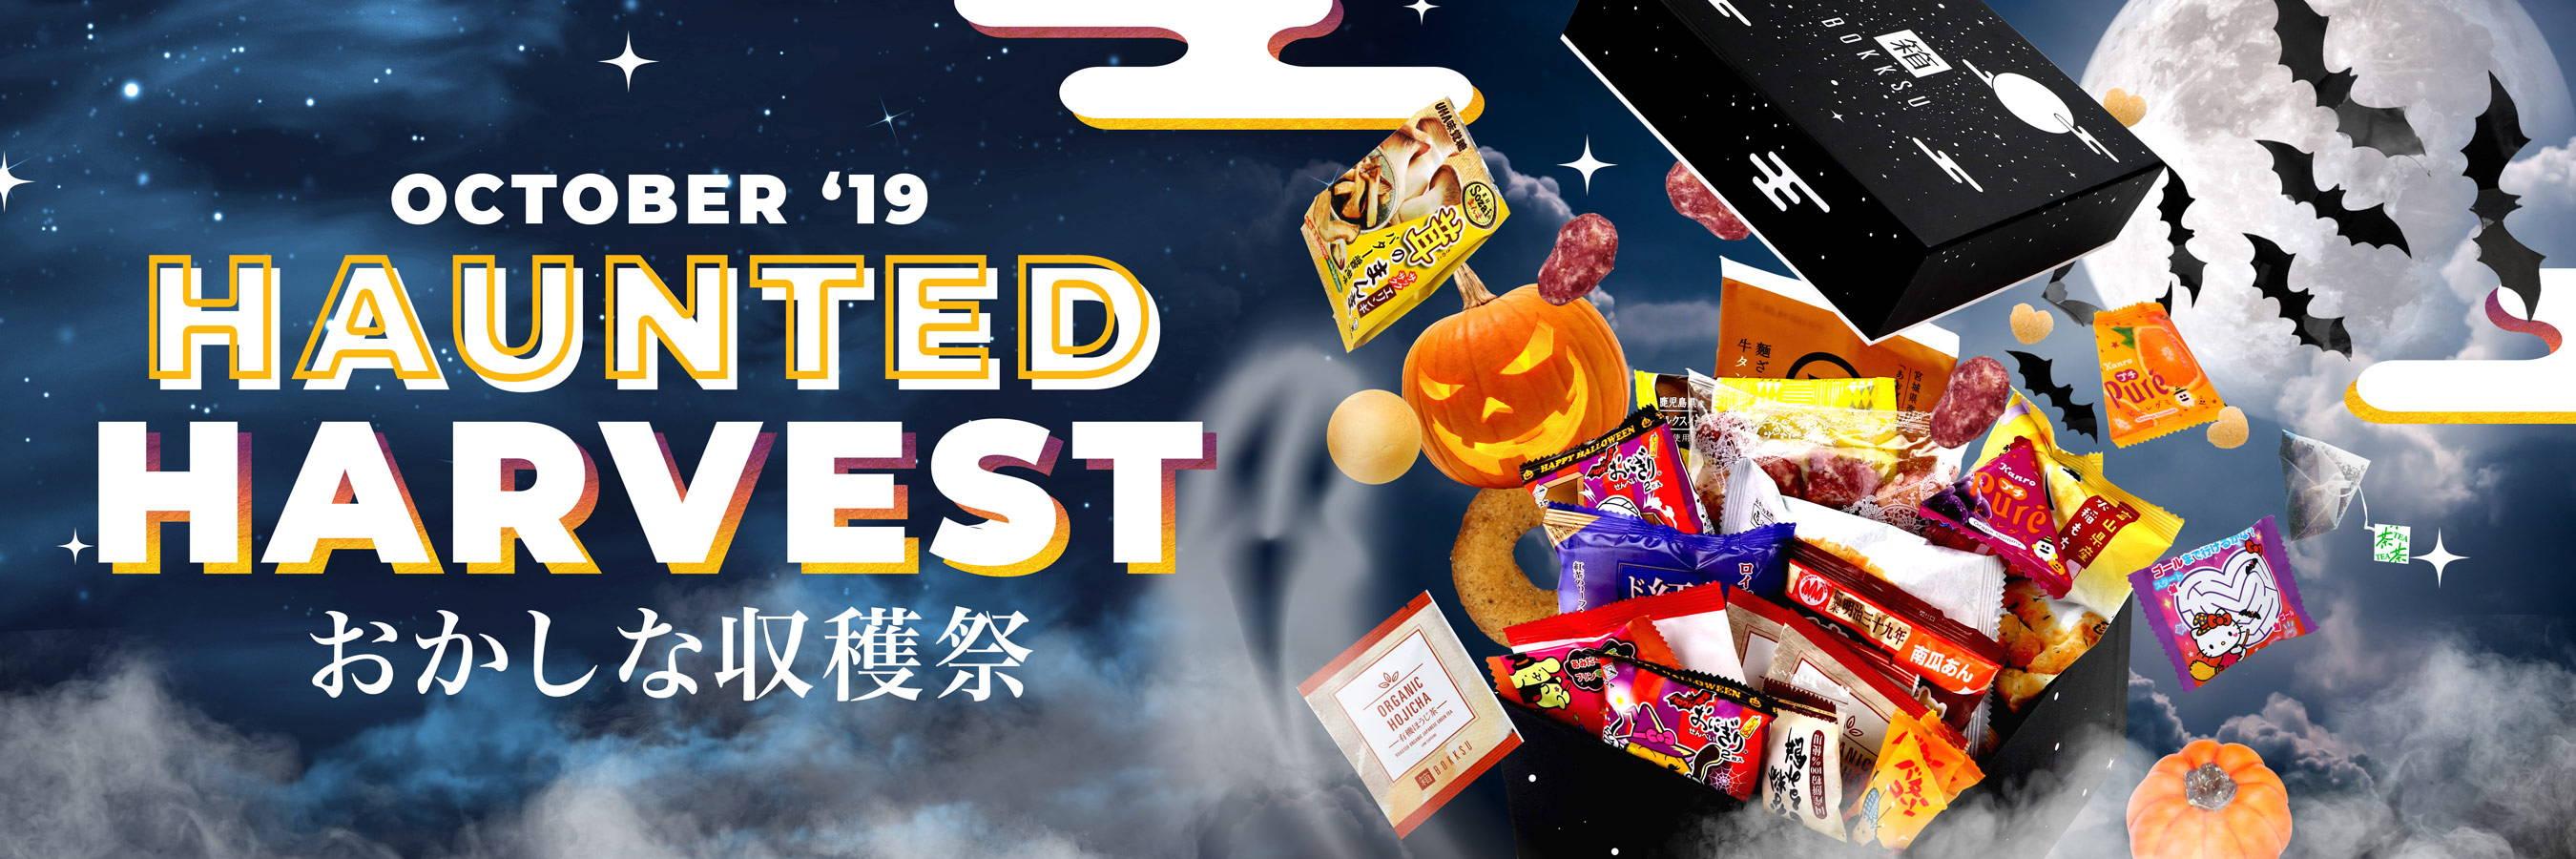 October Haunted Harvest Bokksu